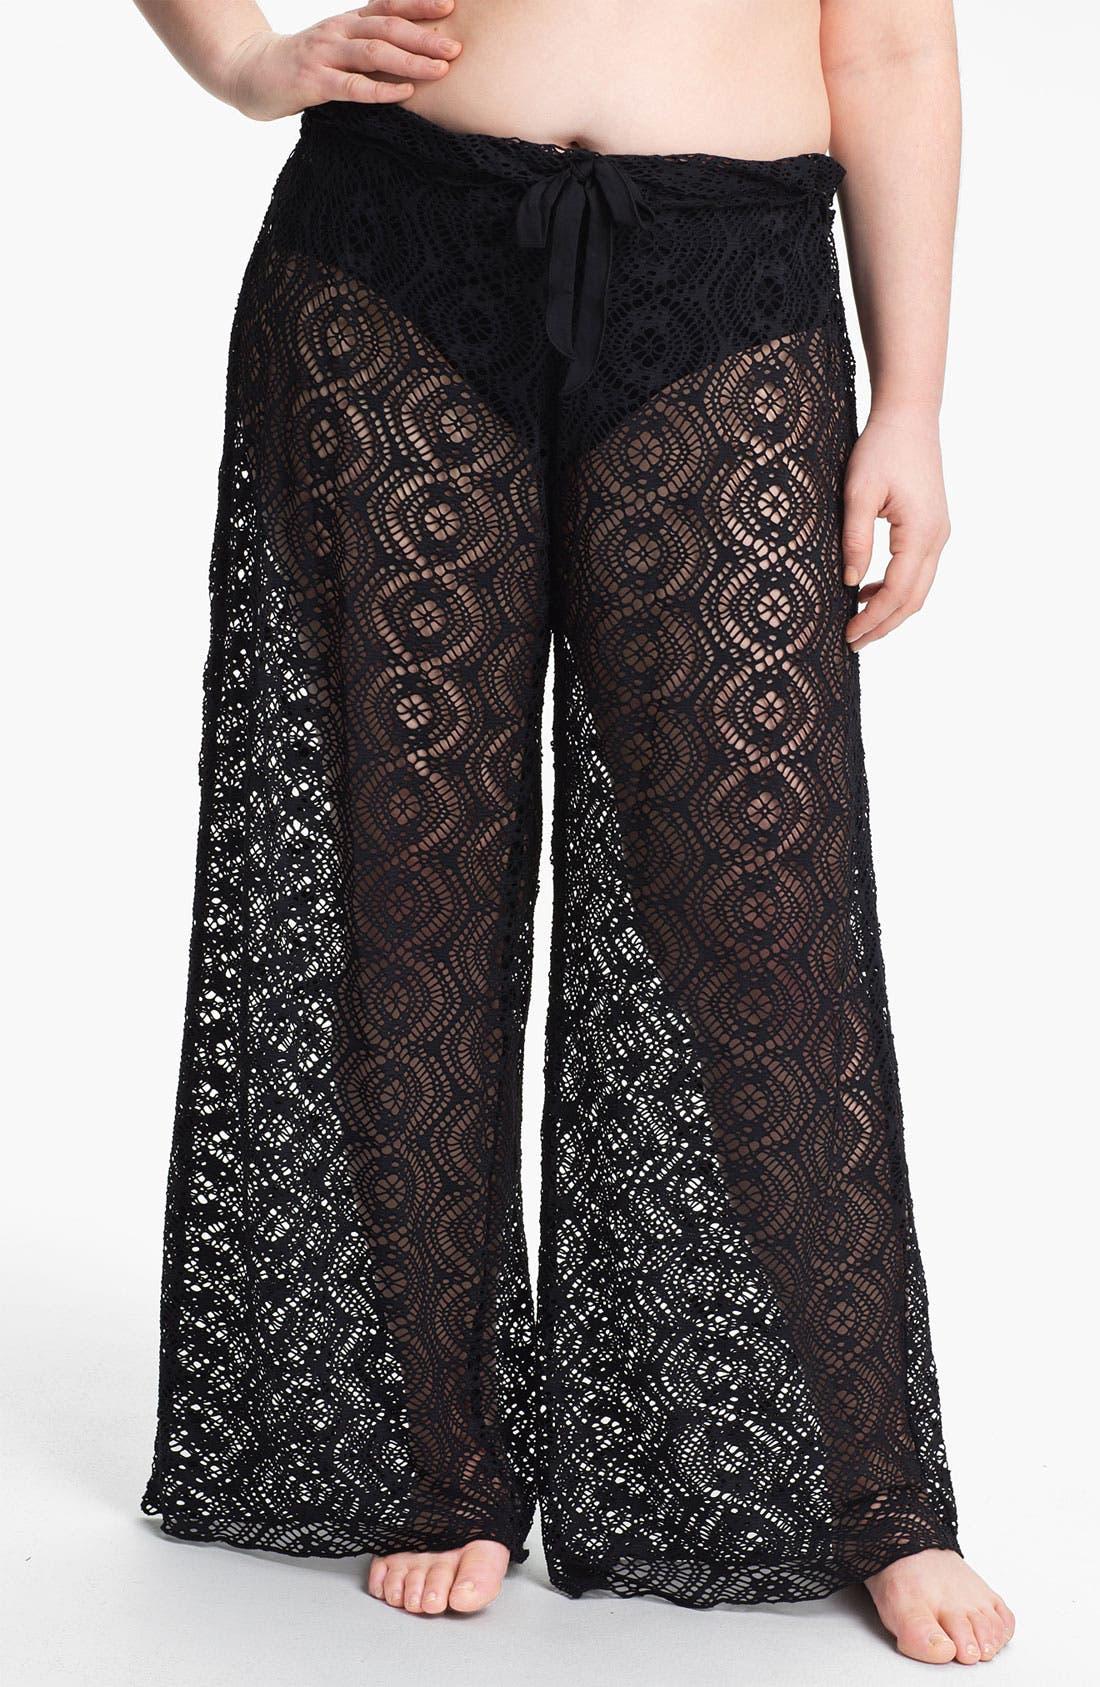 Main Image - Becca Etc. 'Marbella' Crochet Cover-Up Pants (Plus Size)